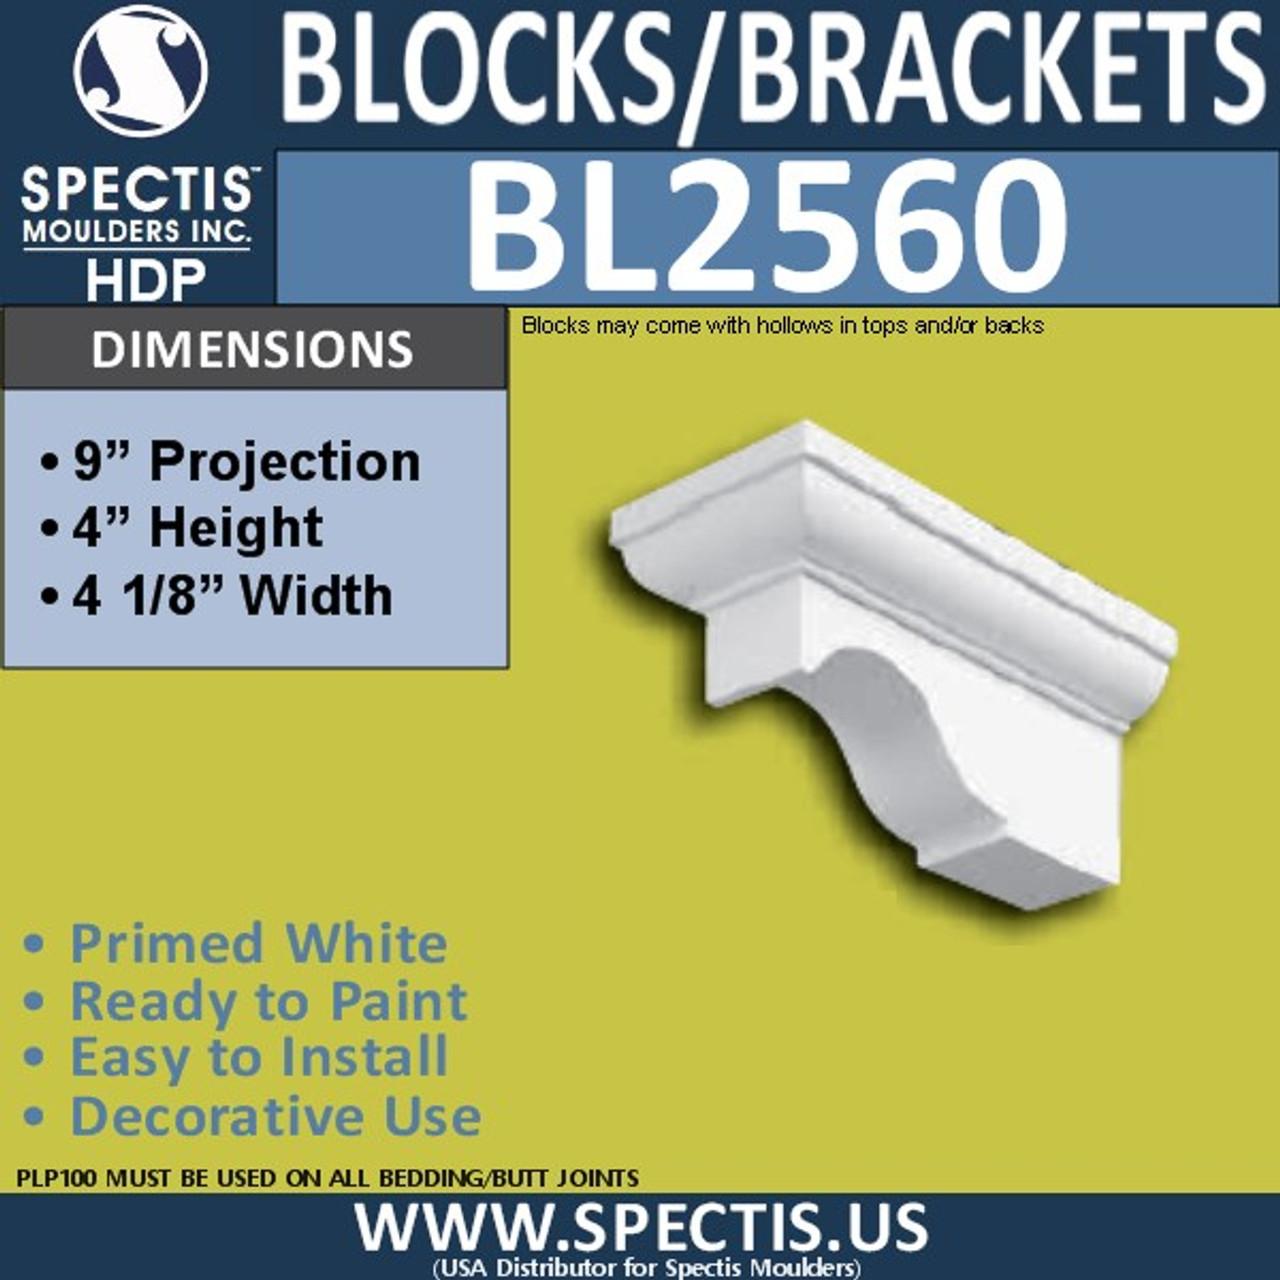 "BL2560 Eave Block or Bracket 4.25""W x 4""H x 9"" P"